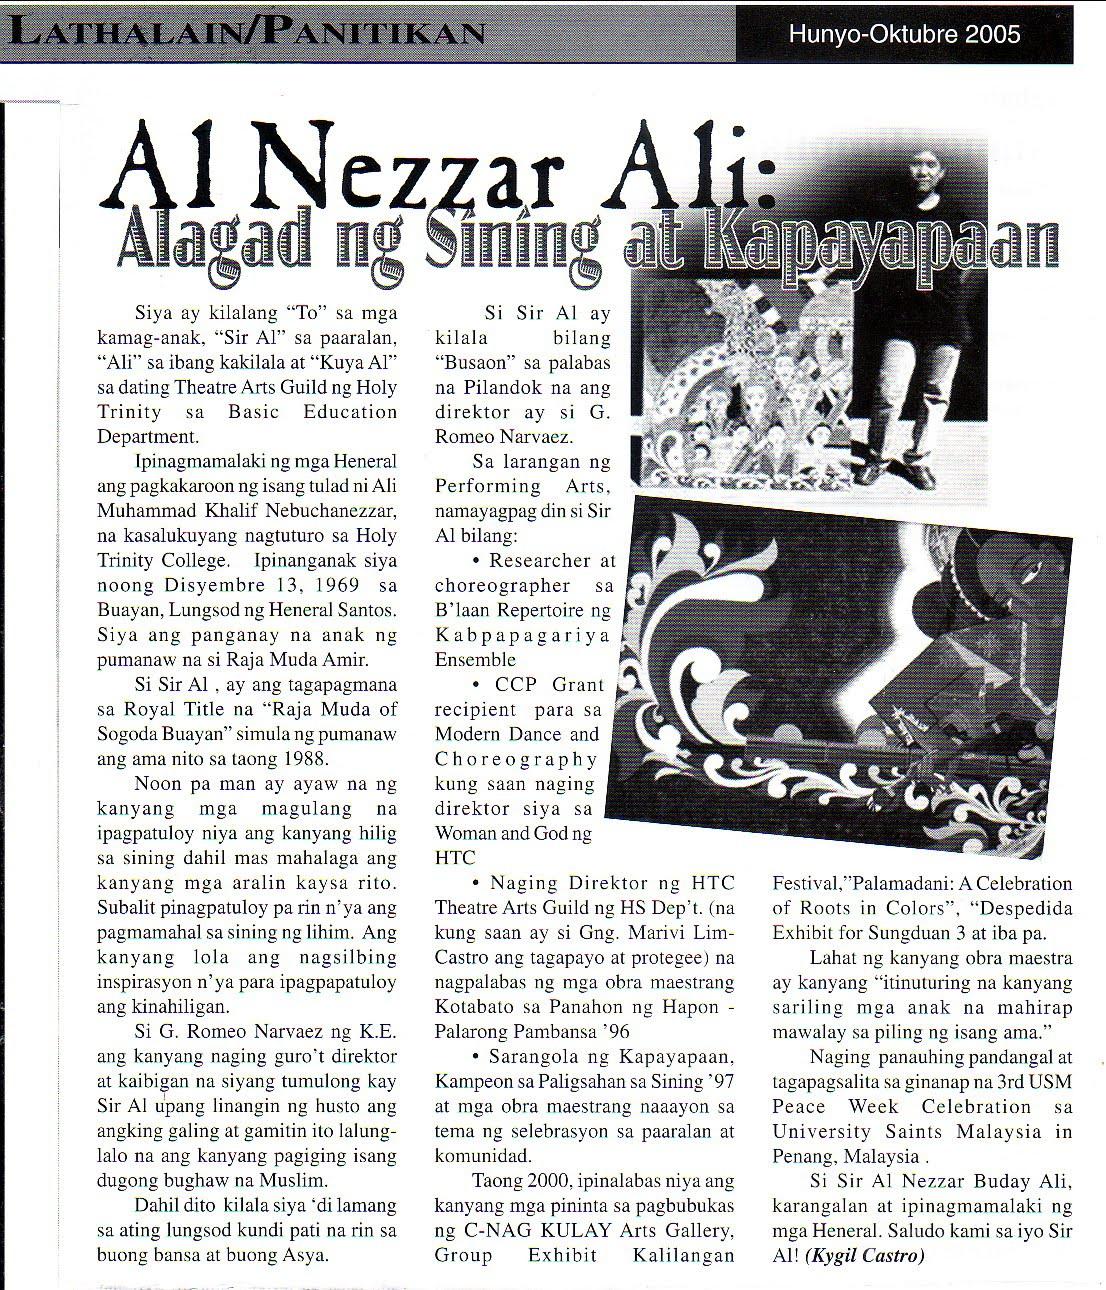 al-nezzar ali: PATCA, Imao, Art Activities & Write Ups